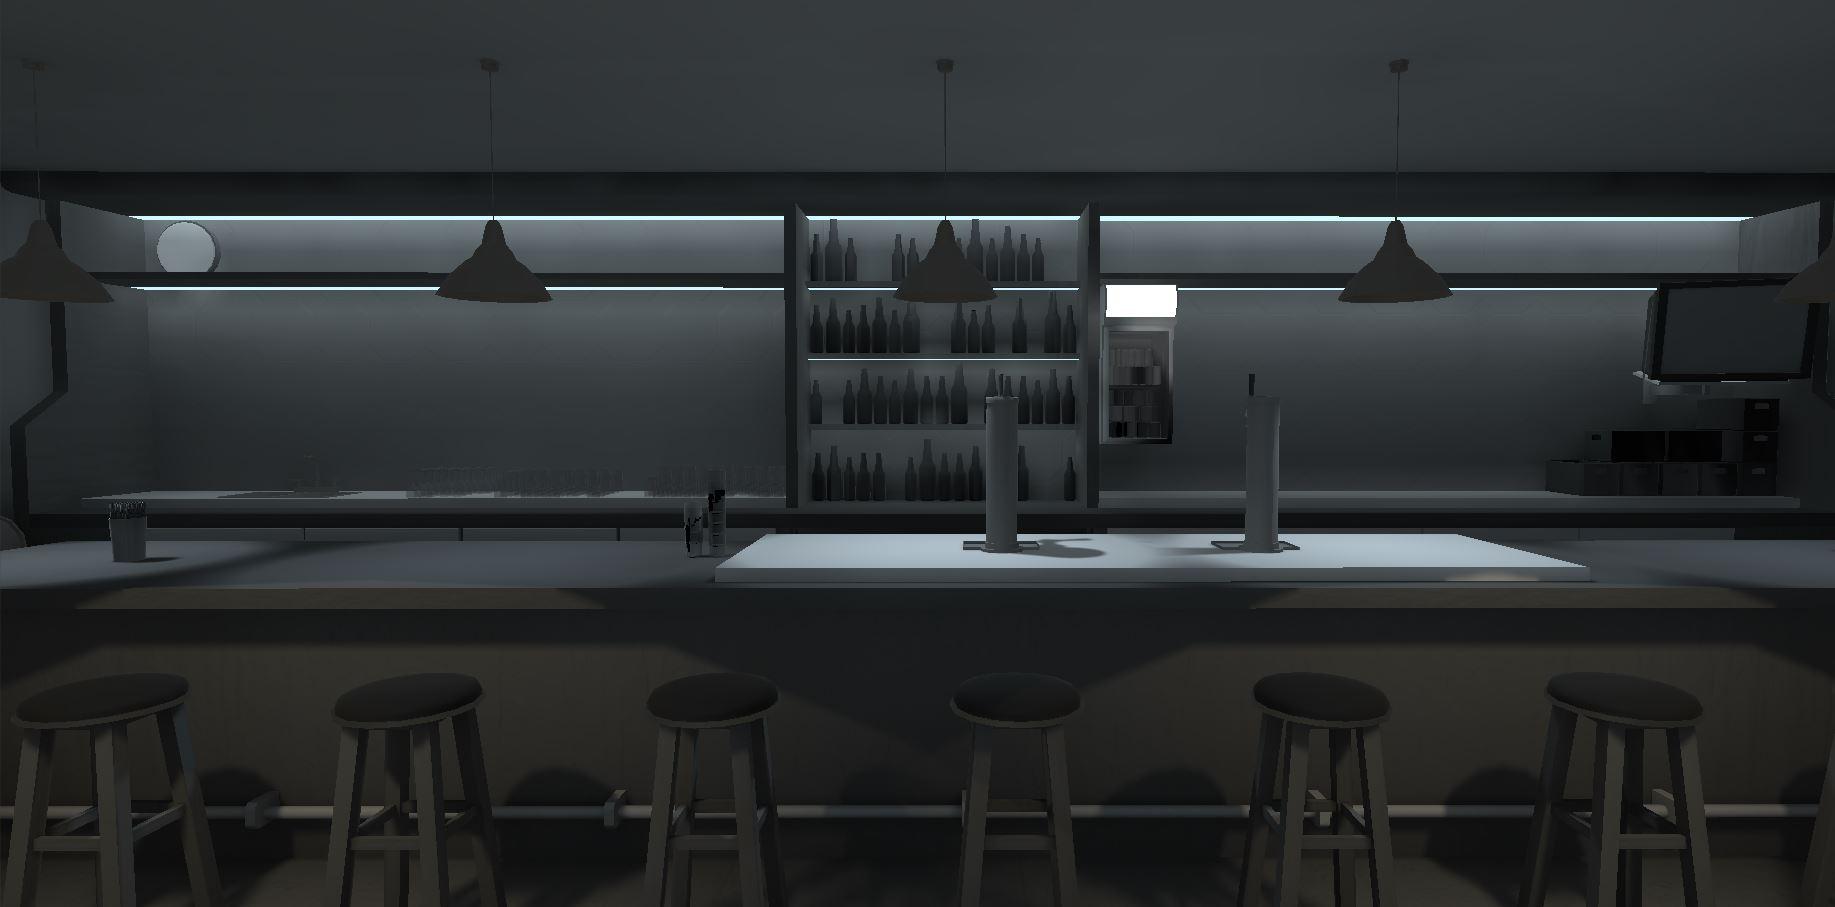 Student bar 10